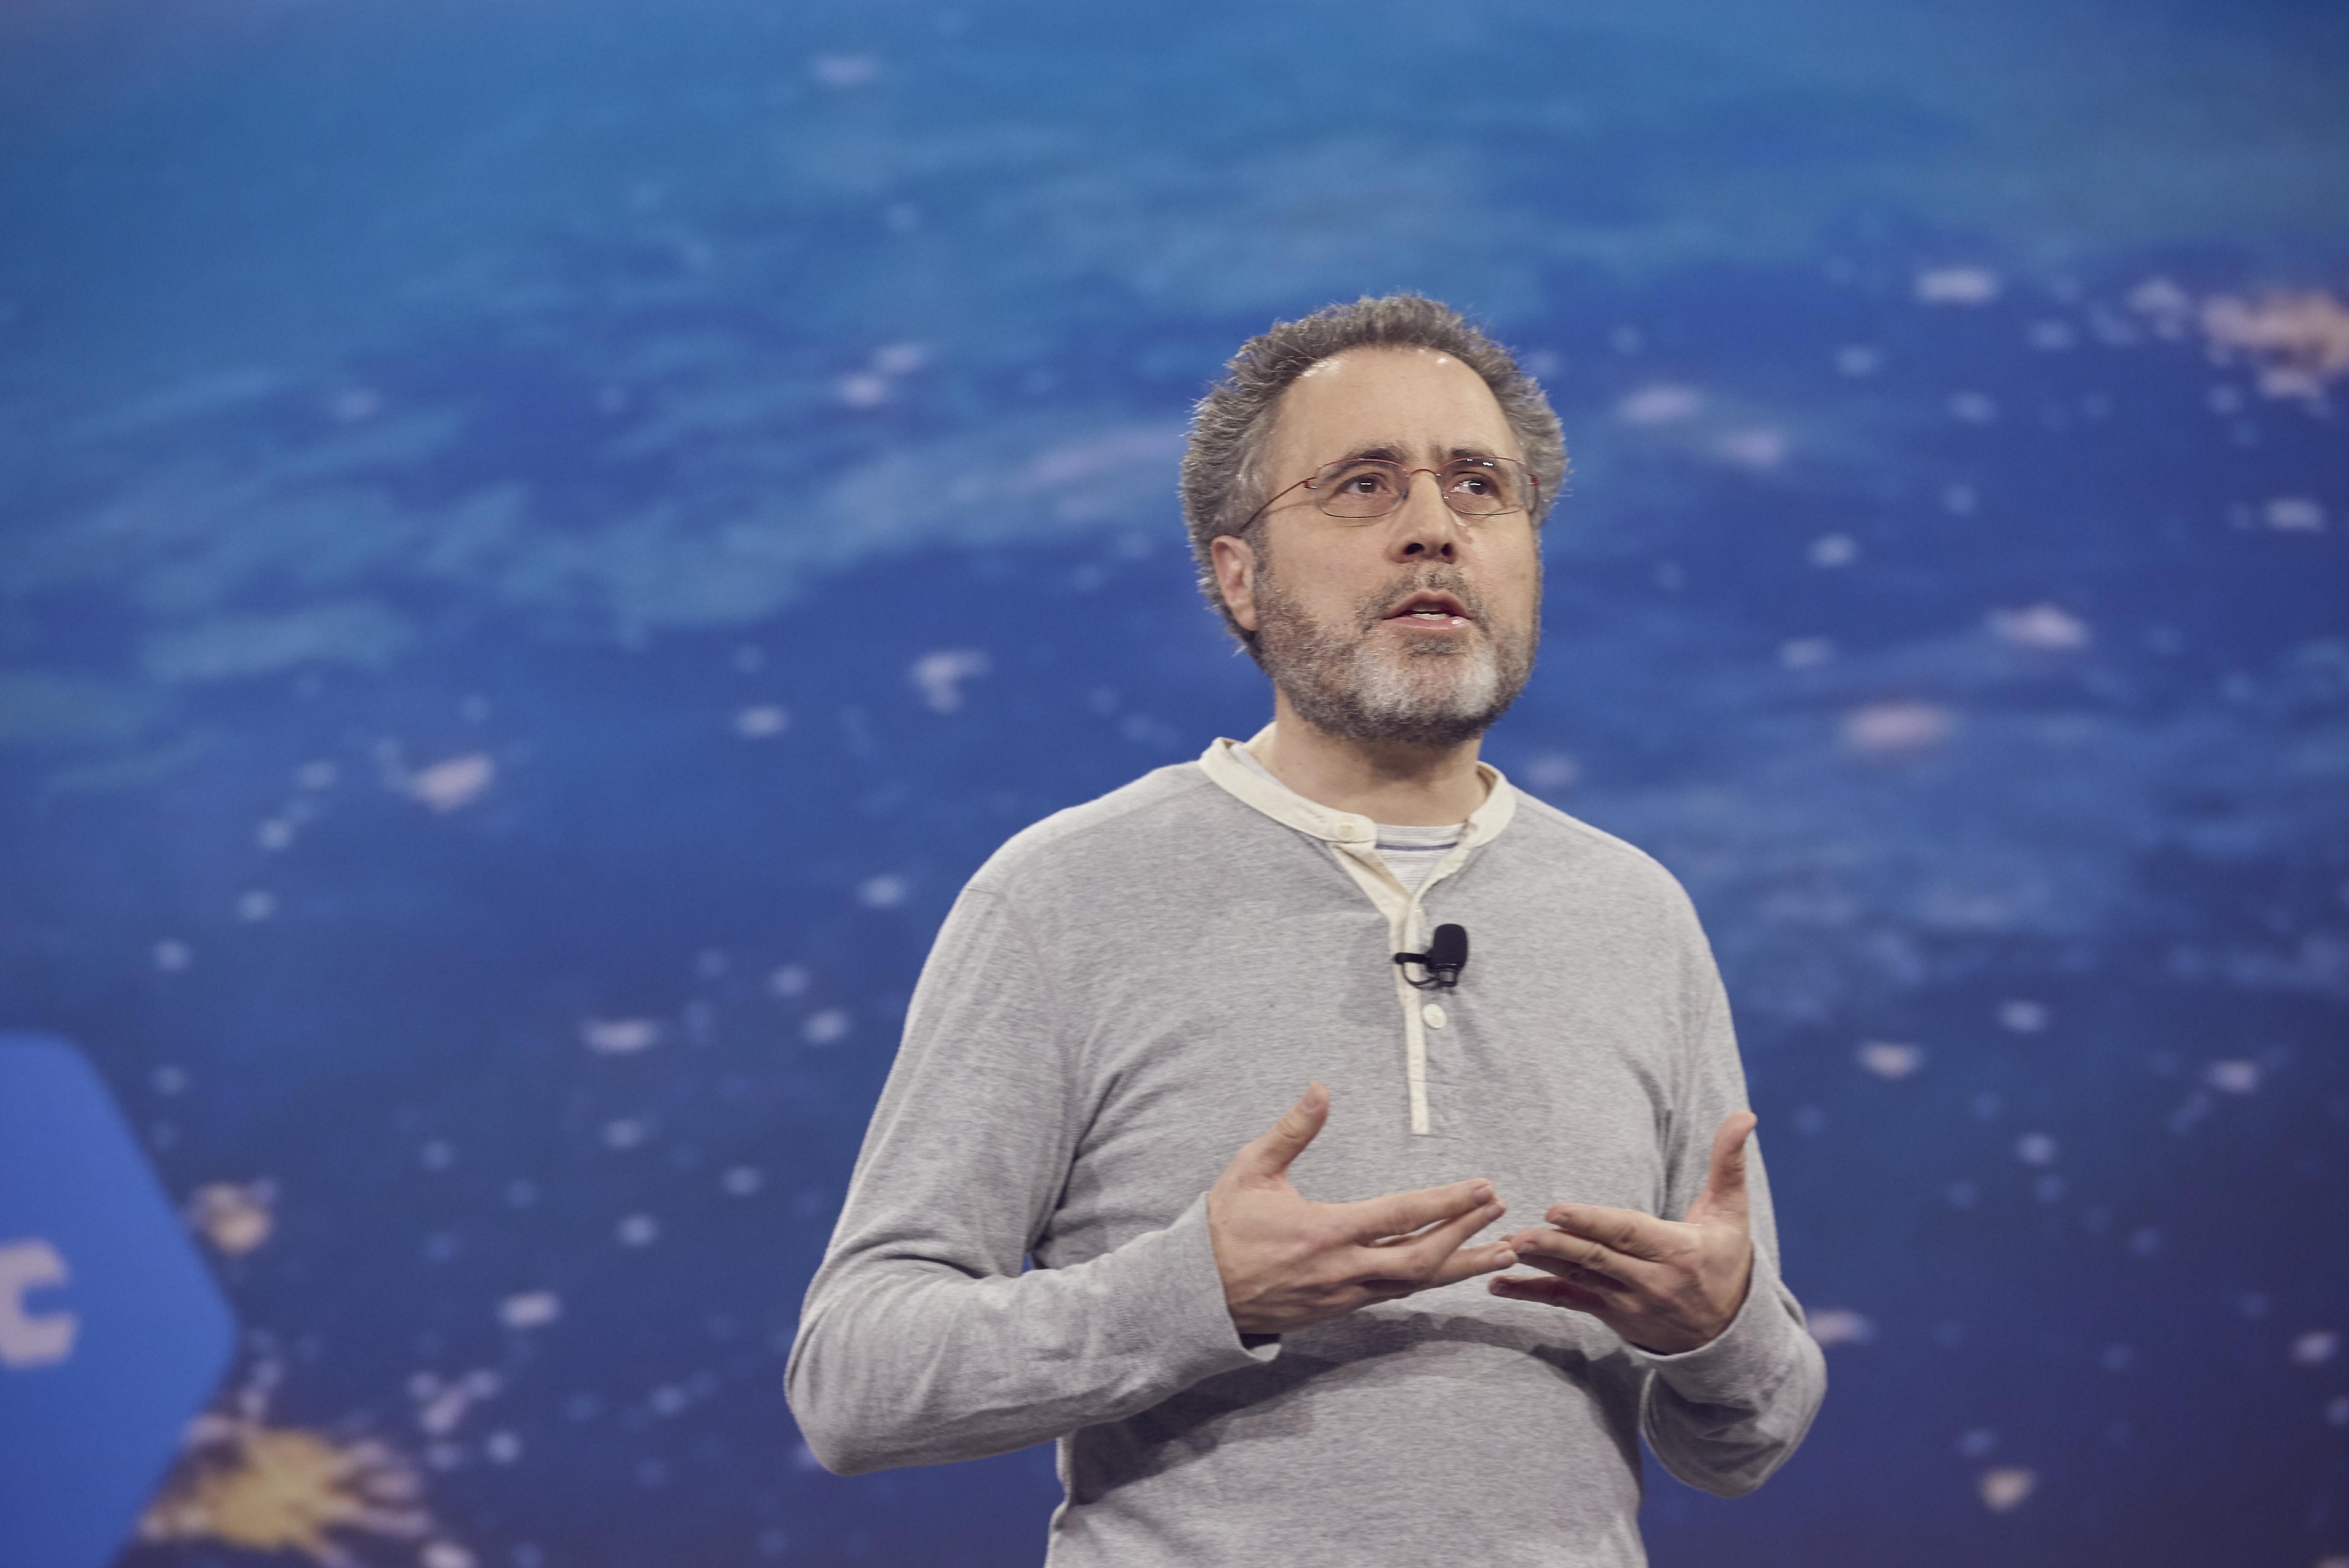 Urs Hölzle, Google senior vice president of infrastructure